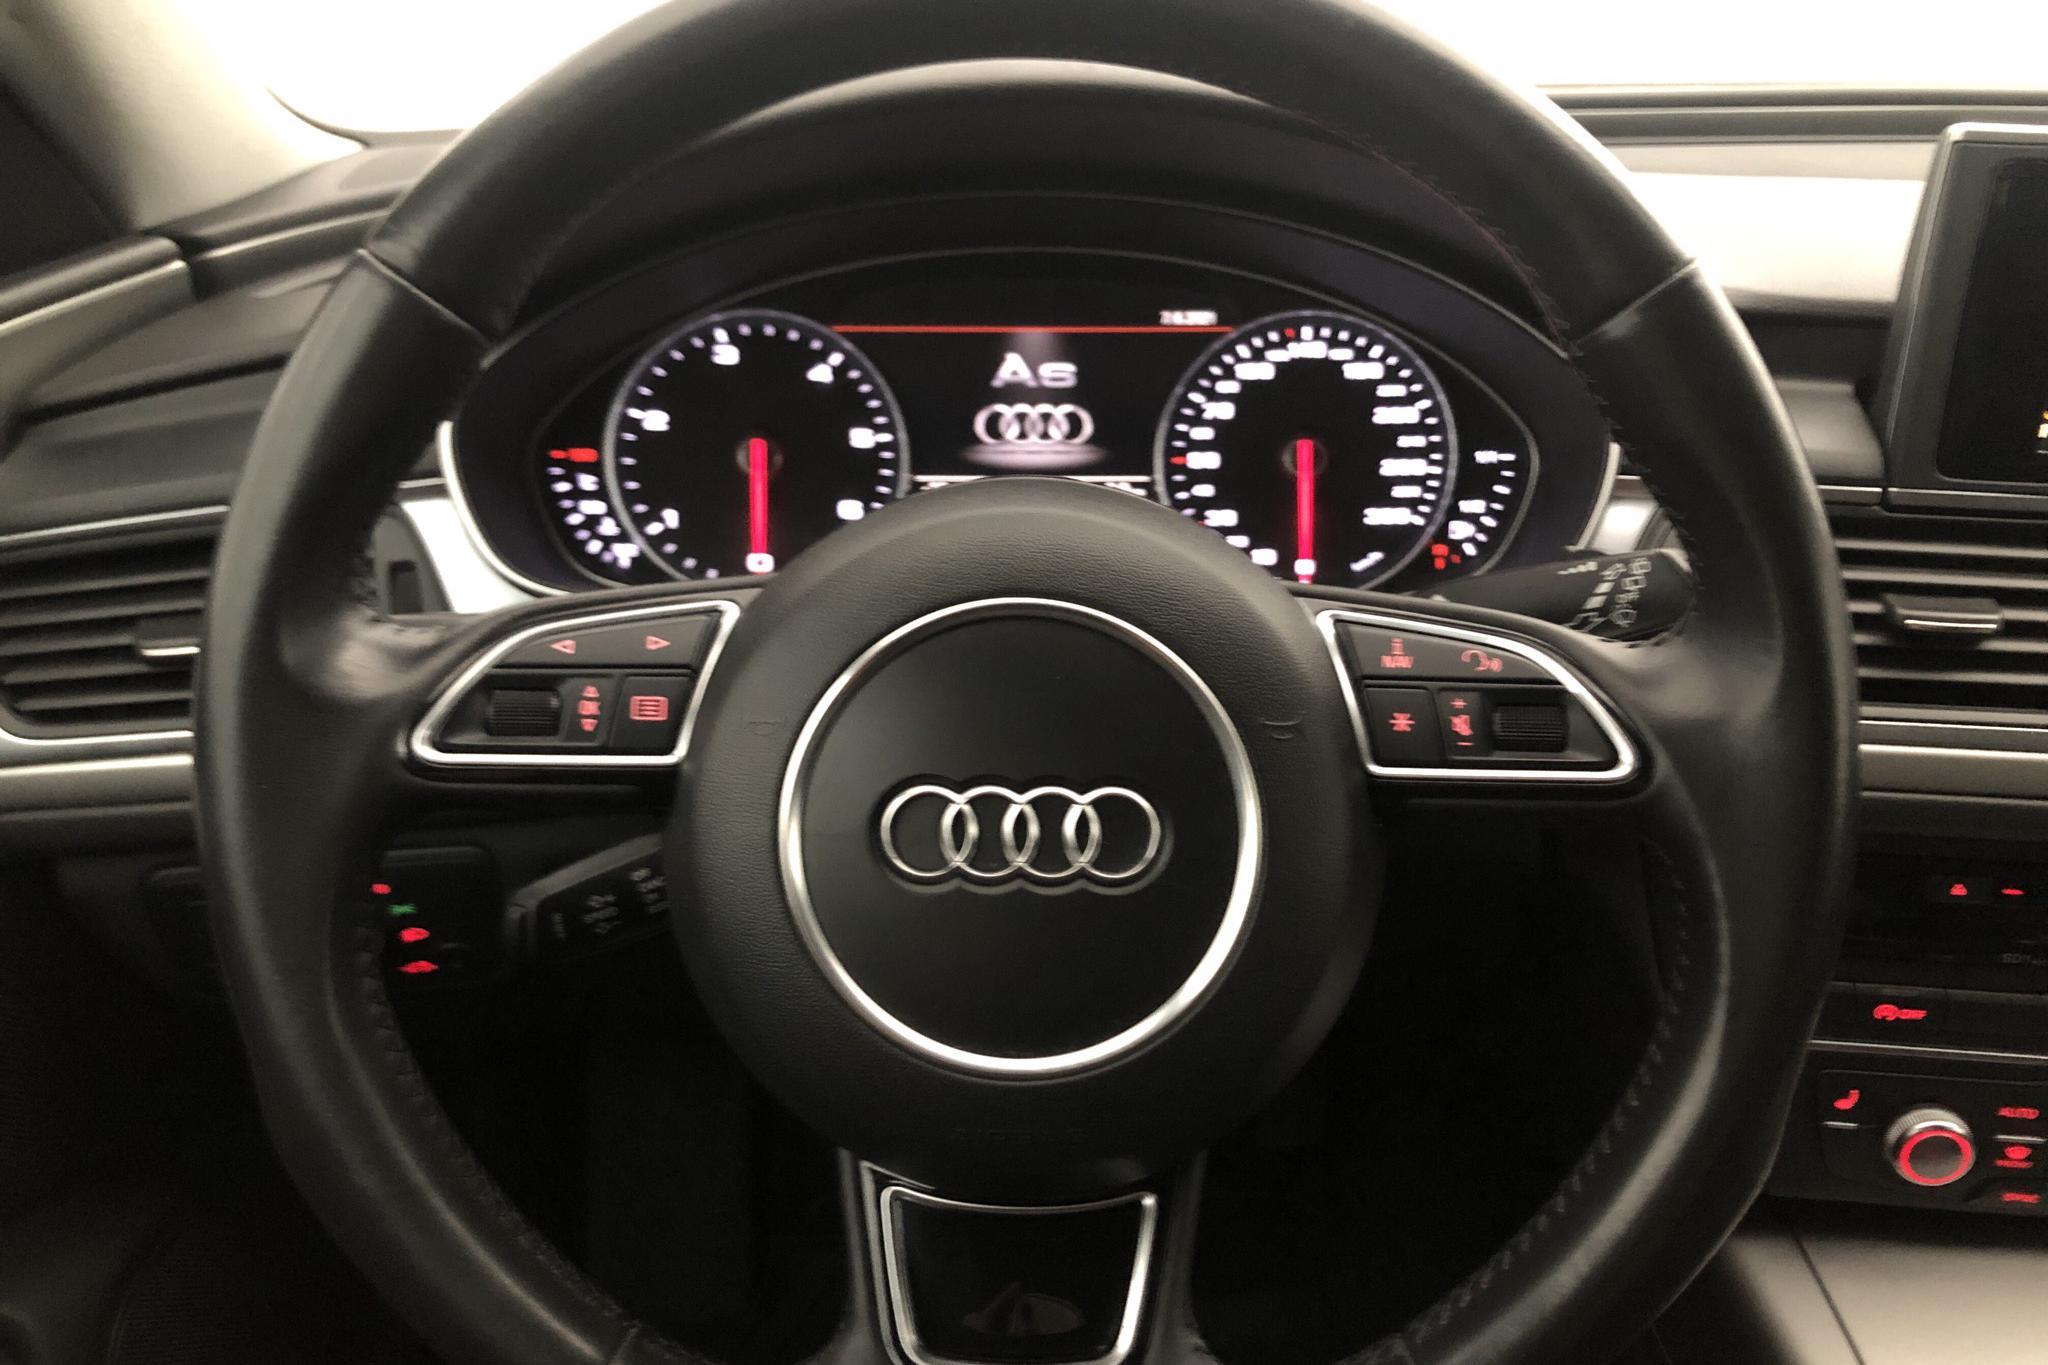 Audi A6 3.0 TDI Avant quattro (204hk) - 155 080 km - Automatic - silver - 2014